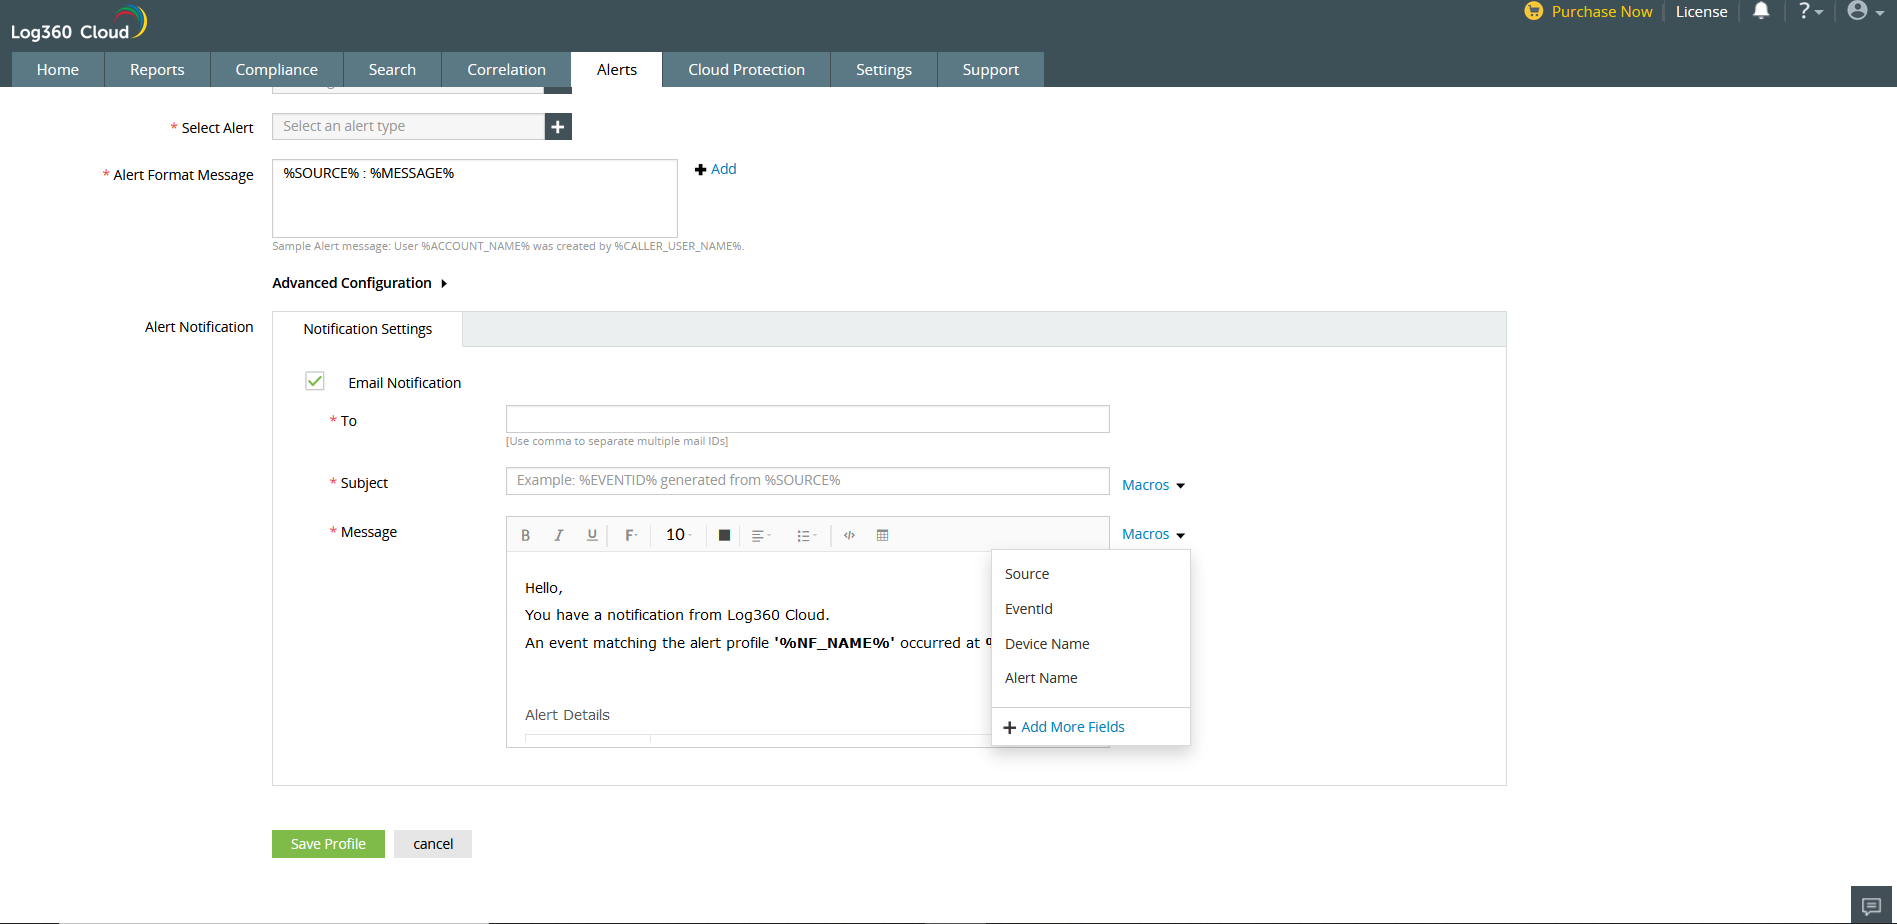 Creating Alert Profiles